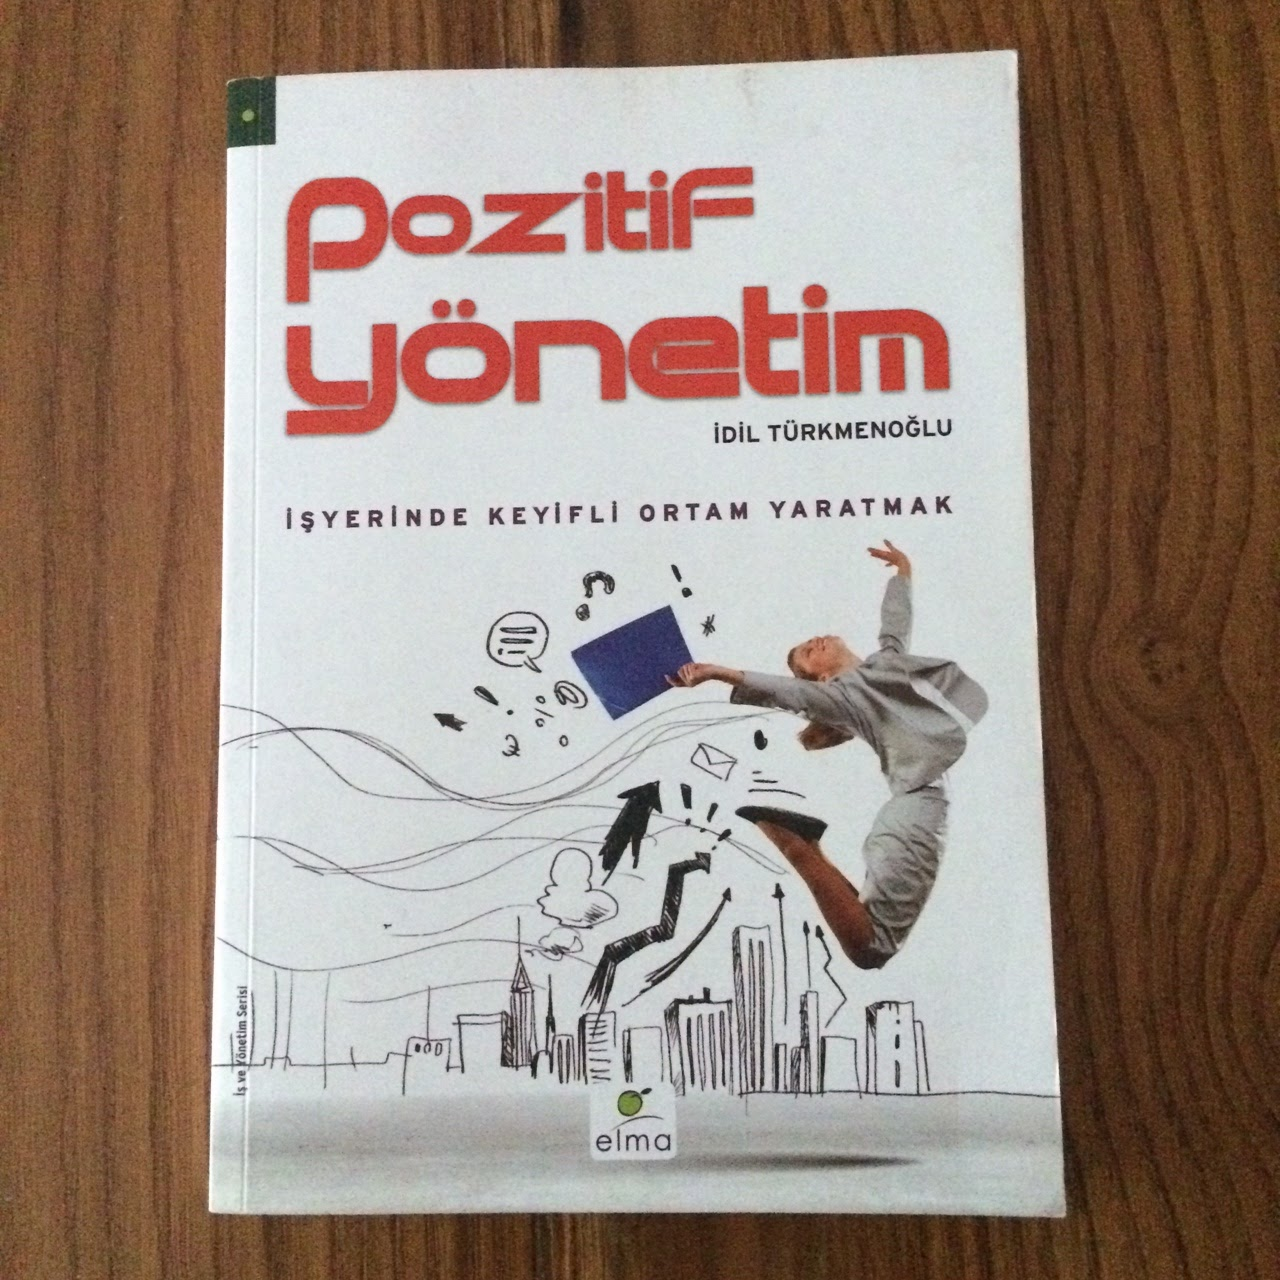 Pozitif Yonetim